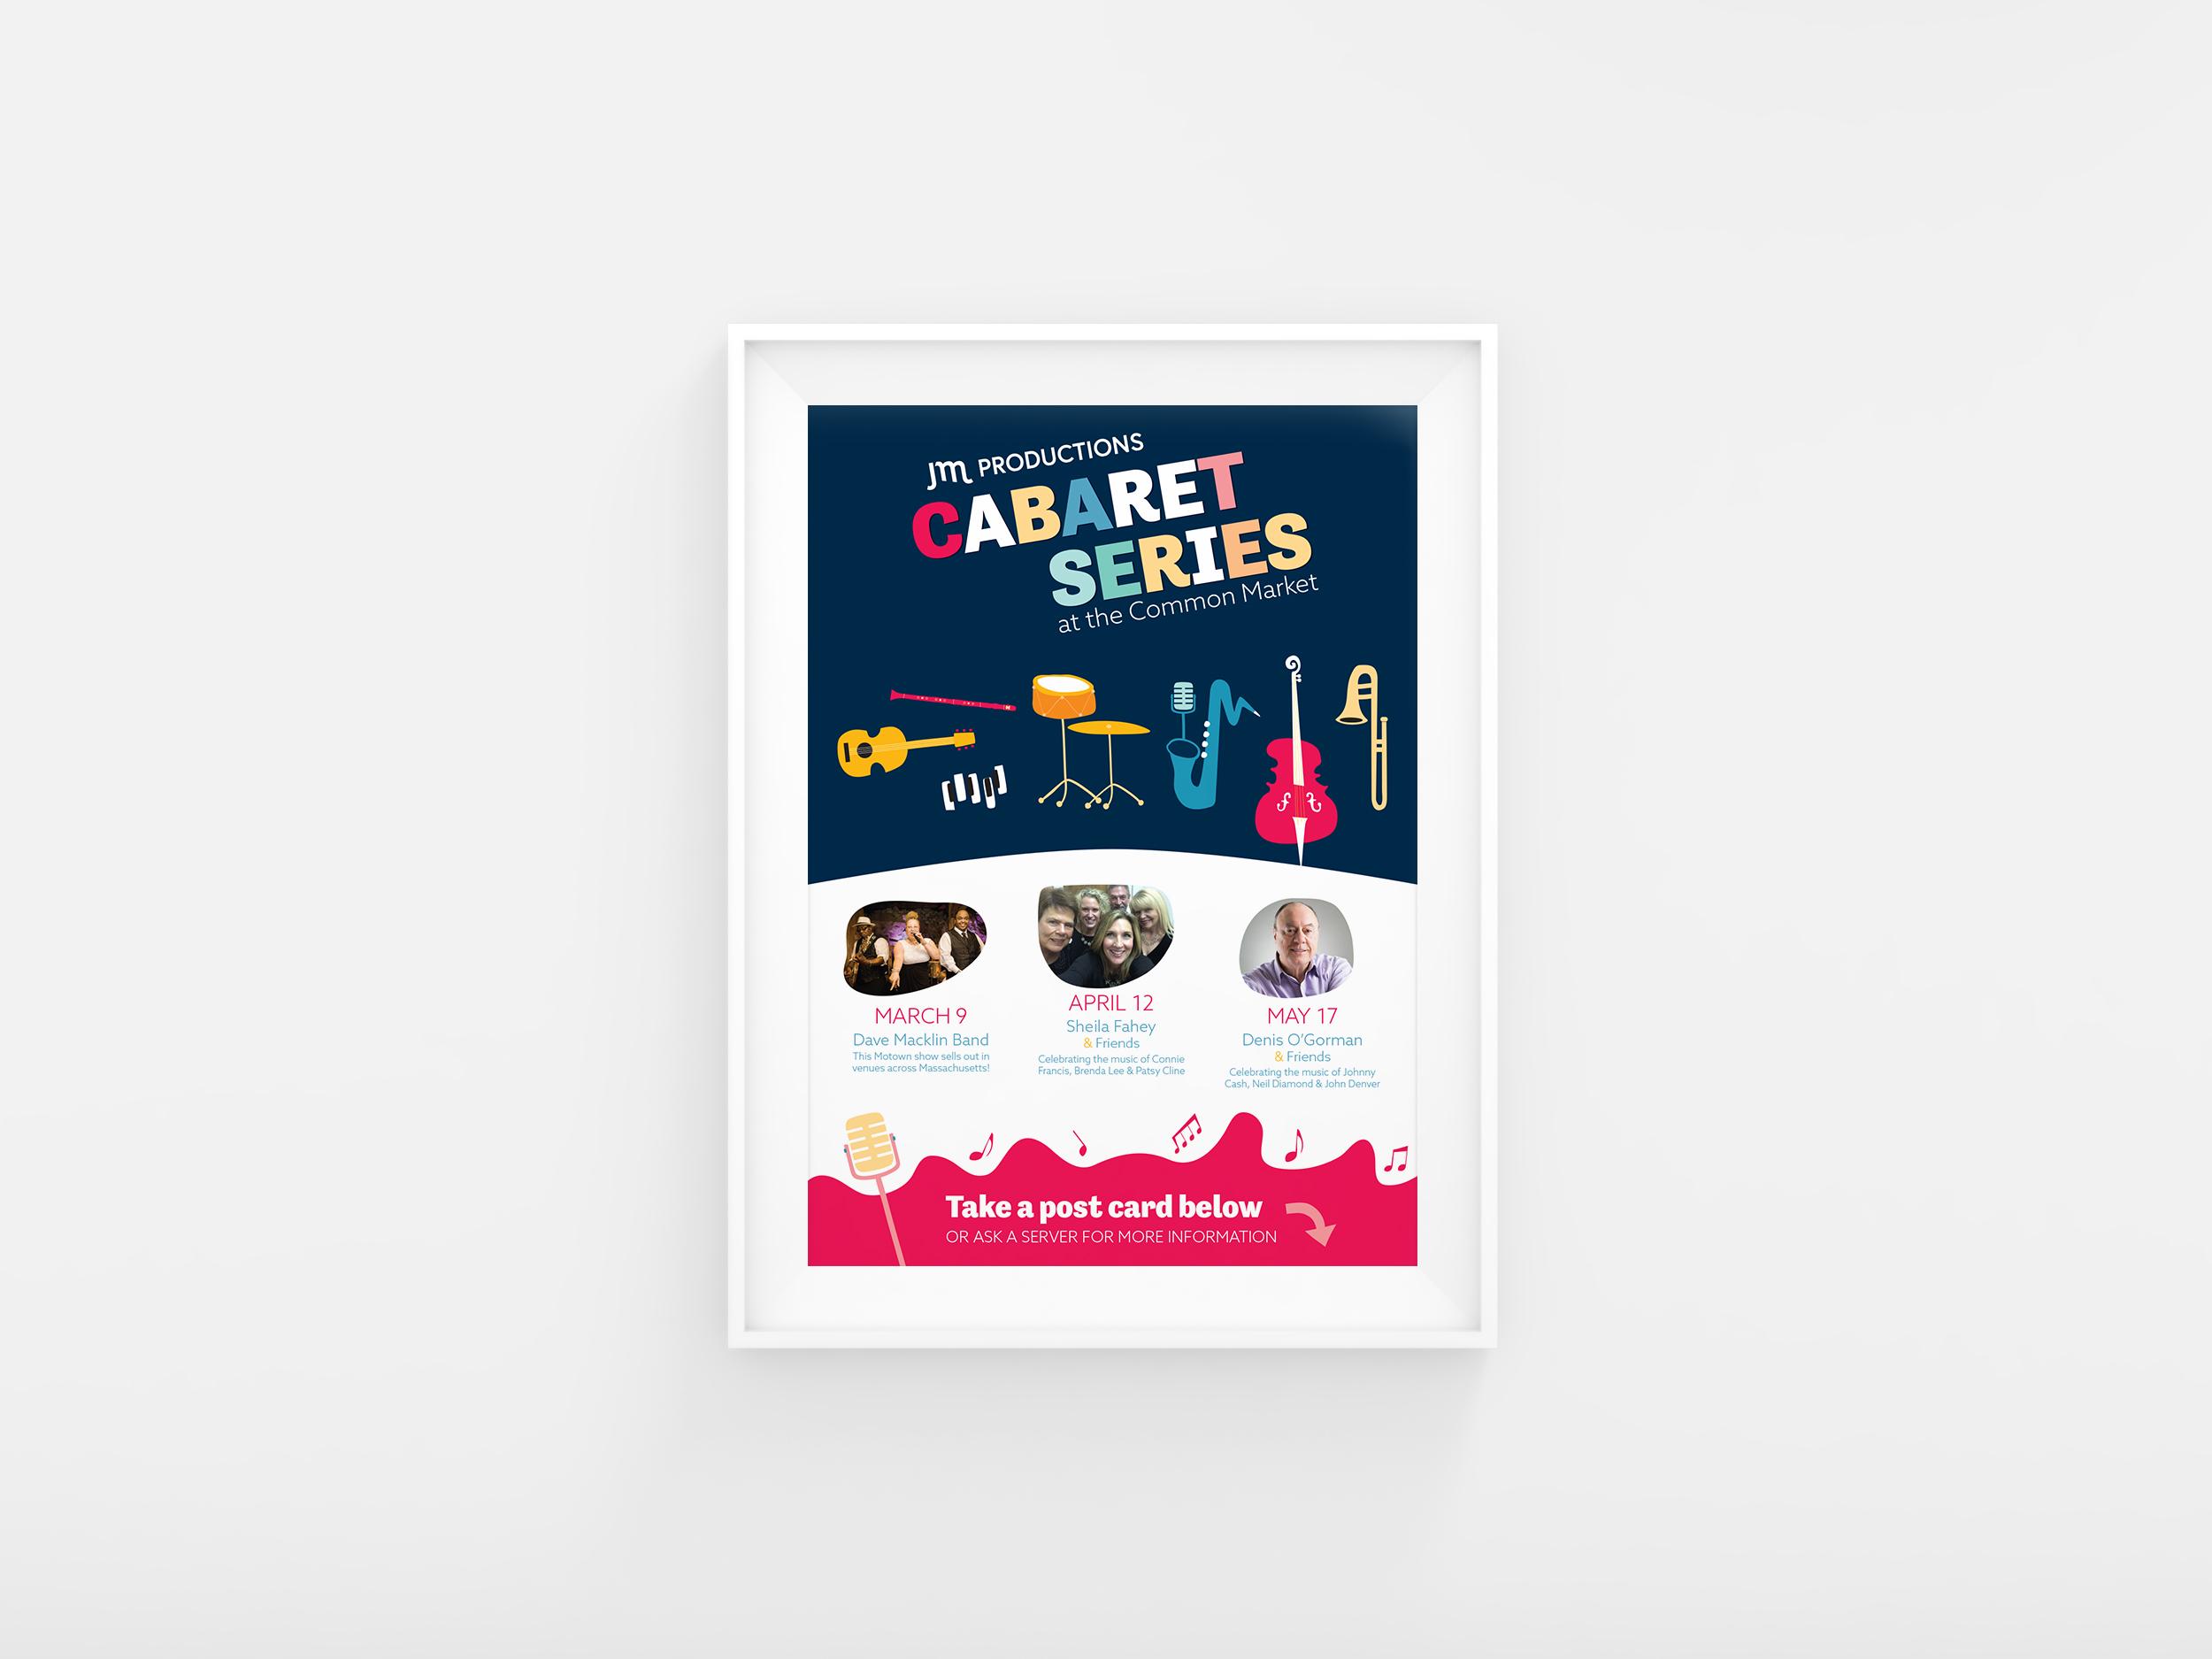 JM Productions cabaret series poster